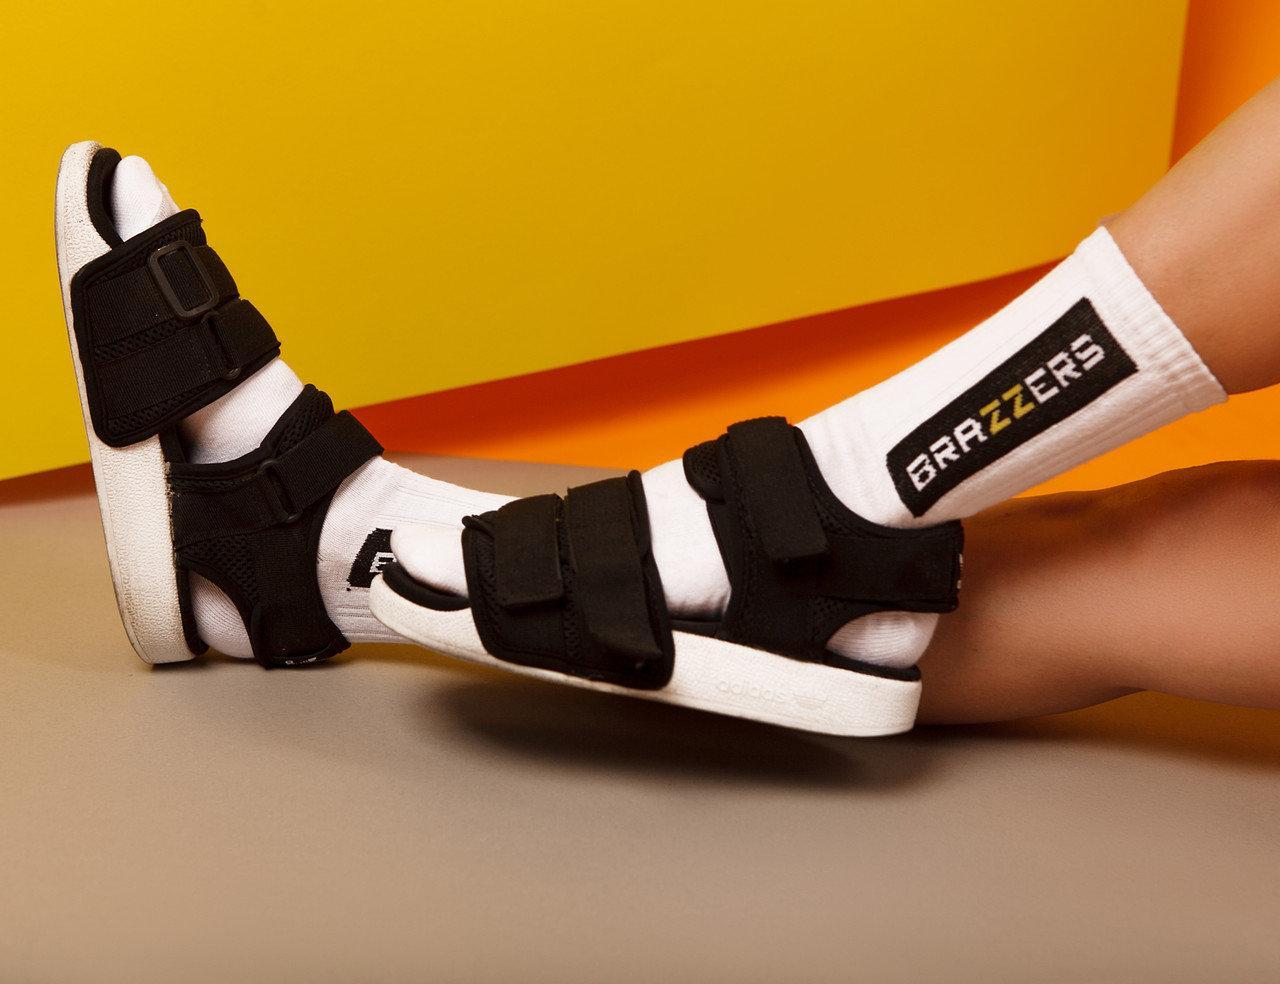 "Ароматизированные носки мужские с принтом ""Brazzers"" Premium"